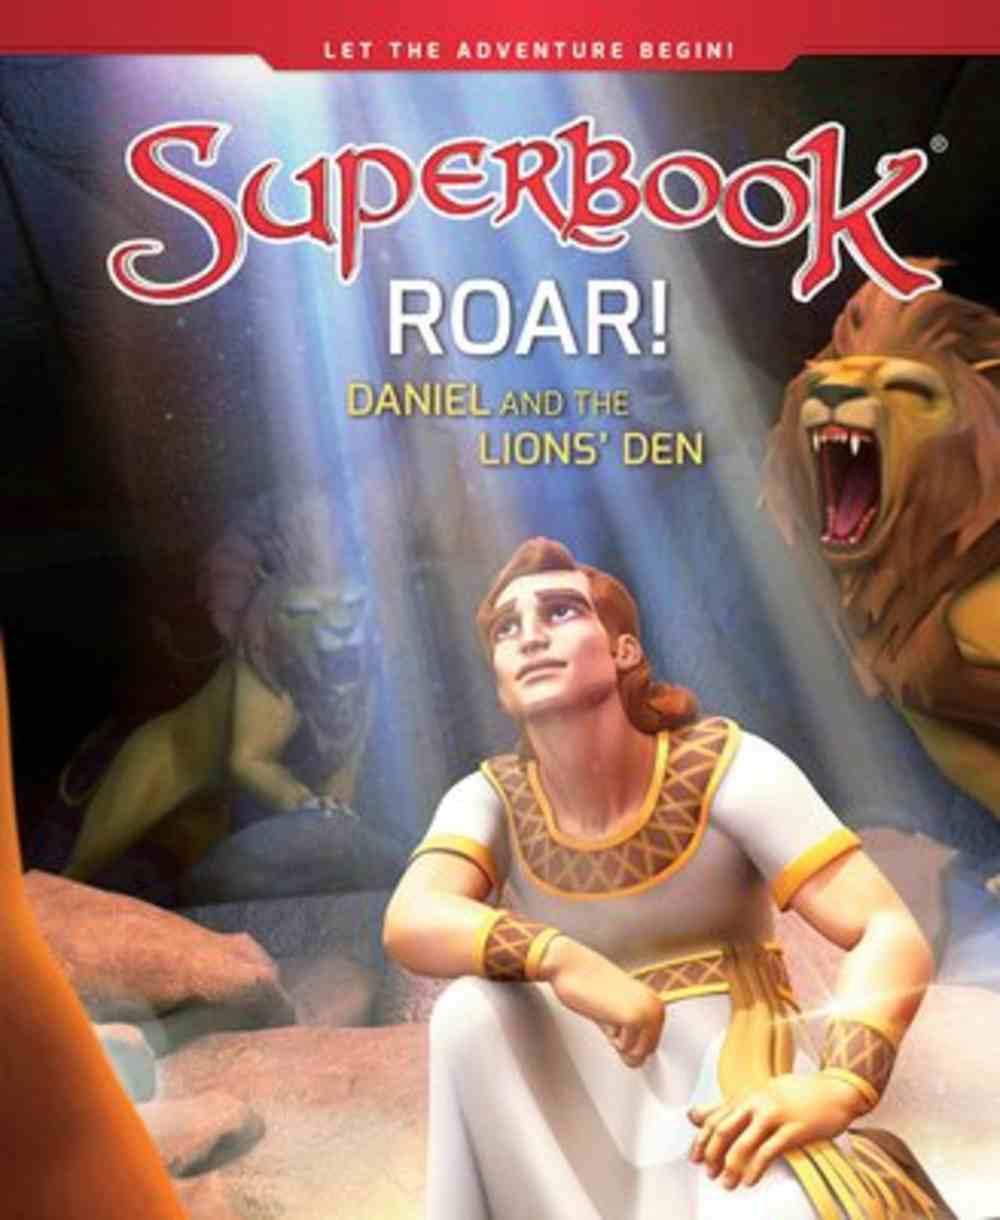 Roar!: Daniel and the Lions' Den (Superbook Series) Hardback